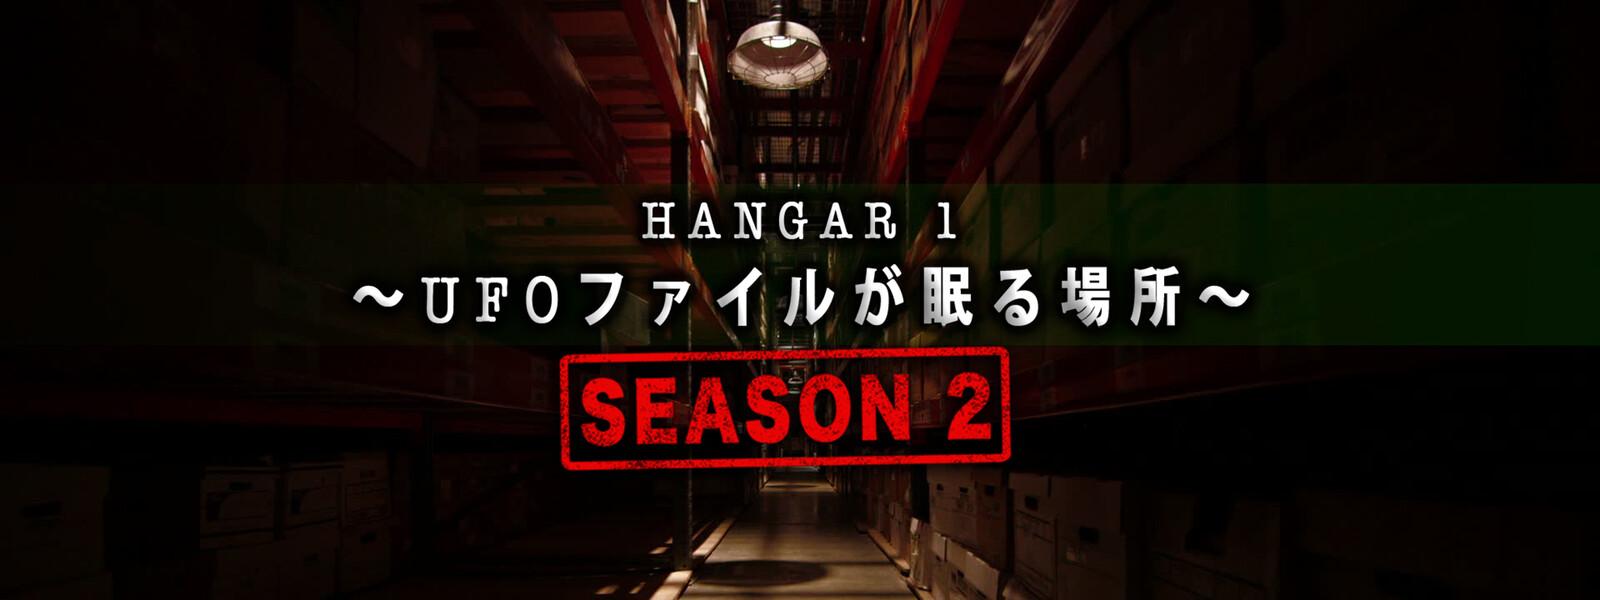 HANGAR 1 ~UFOファイルが眠る場所~ シーズン2 動画